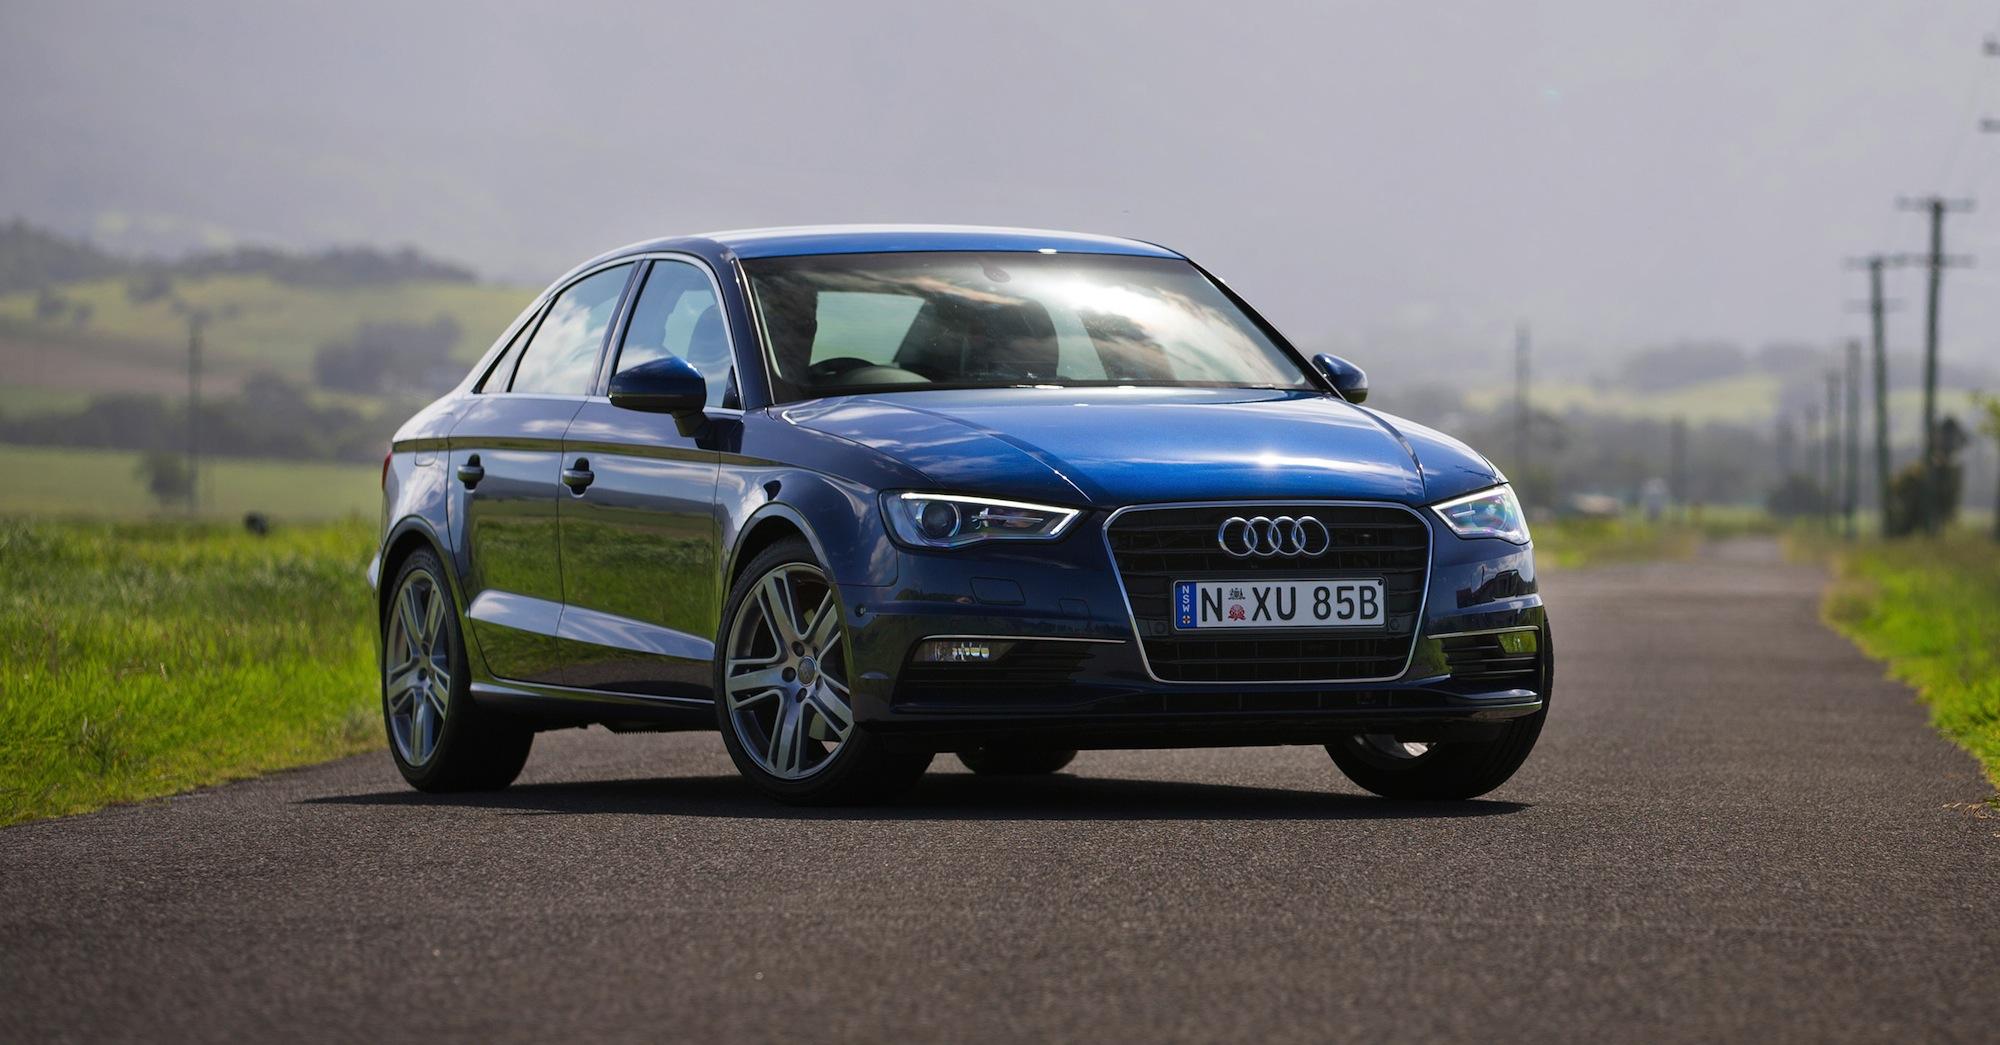 Audi A3 Sedan Review | CarAdvice